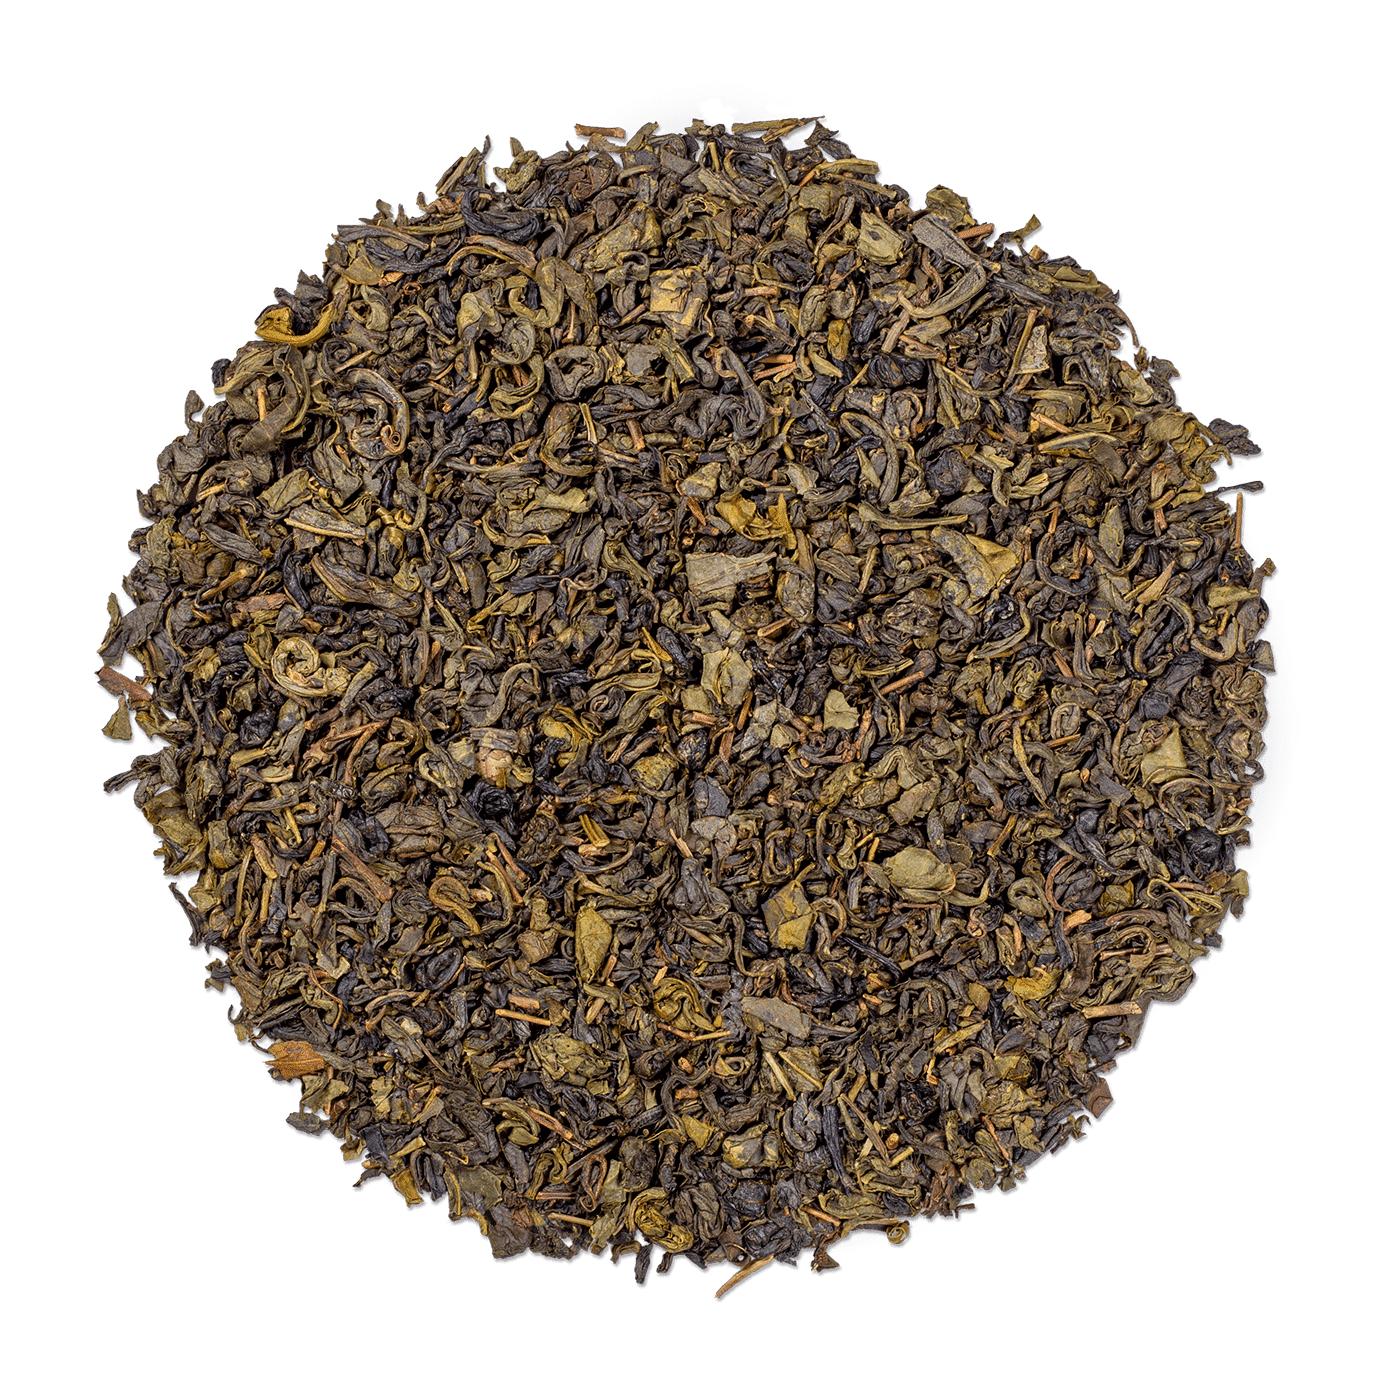 KUSMI TEA Vert Troïka bio - Thé vert, bergamote, agrumes - Thé en vrac - Kusmi Tea